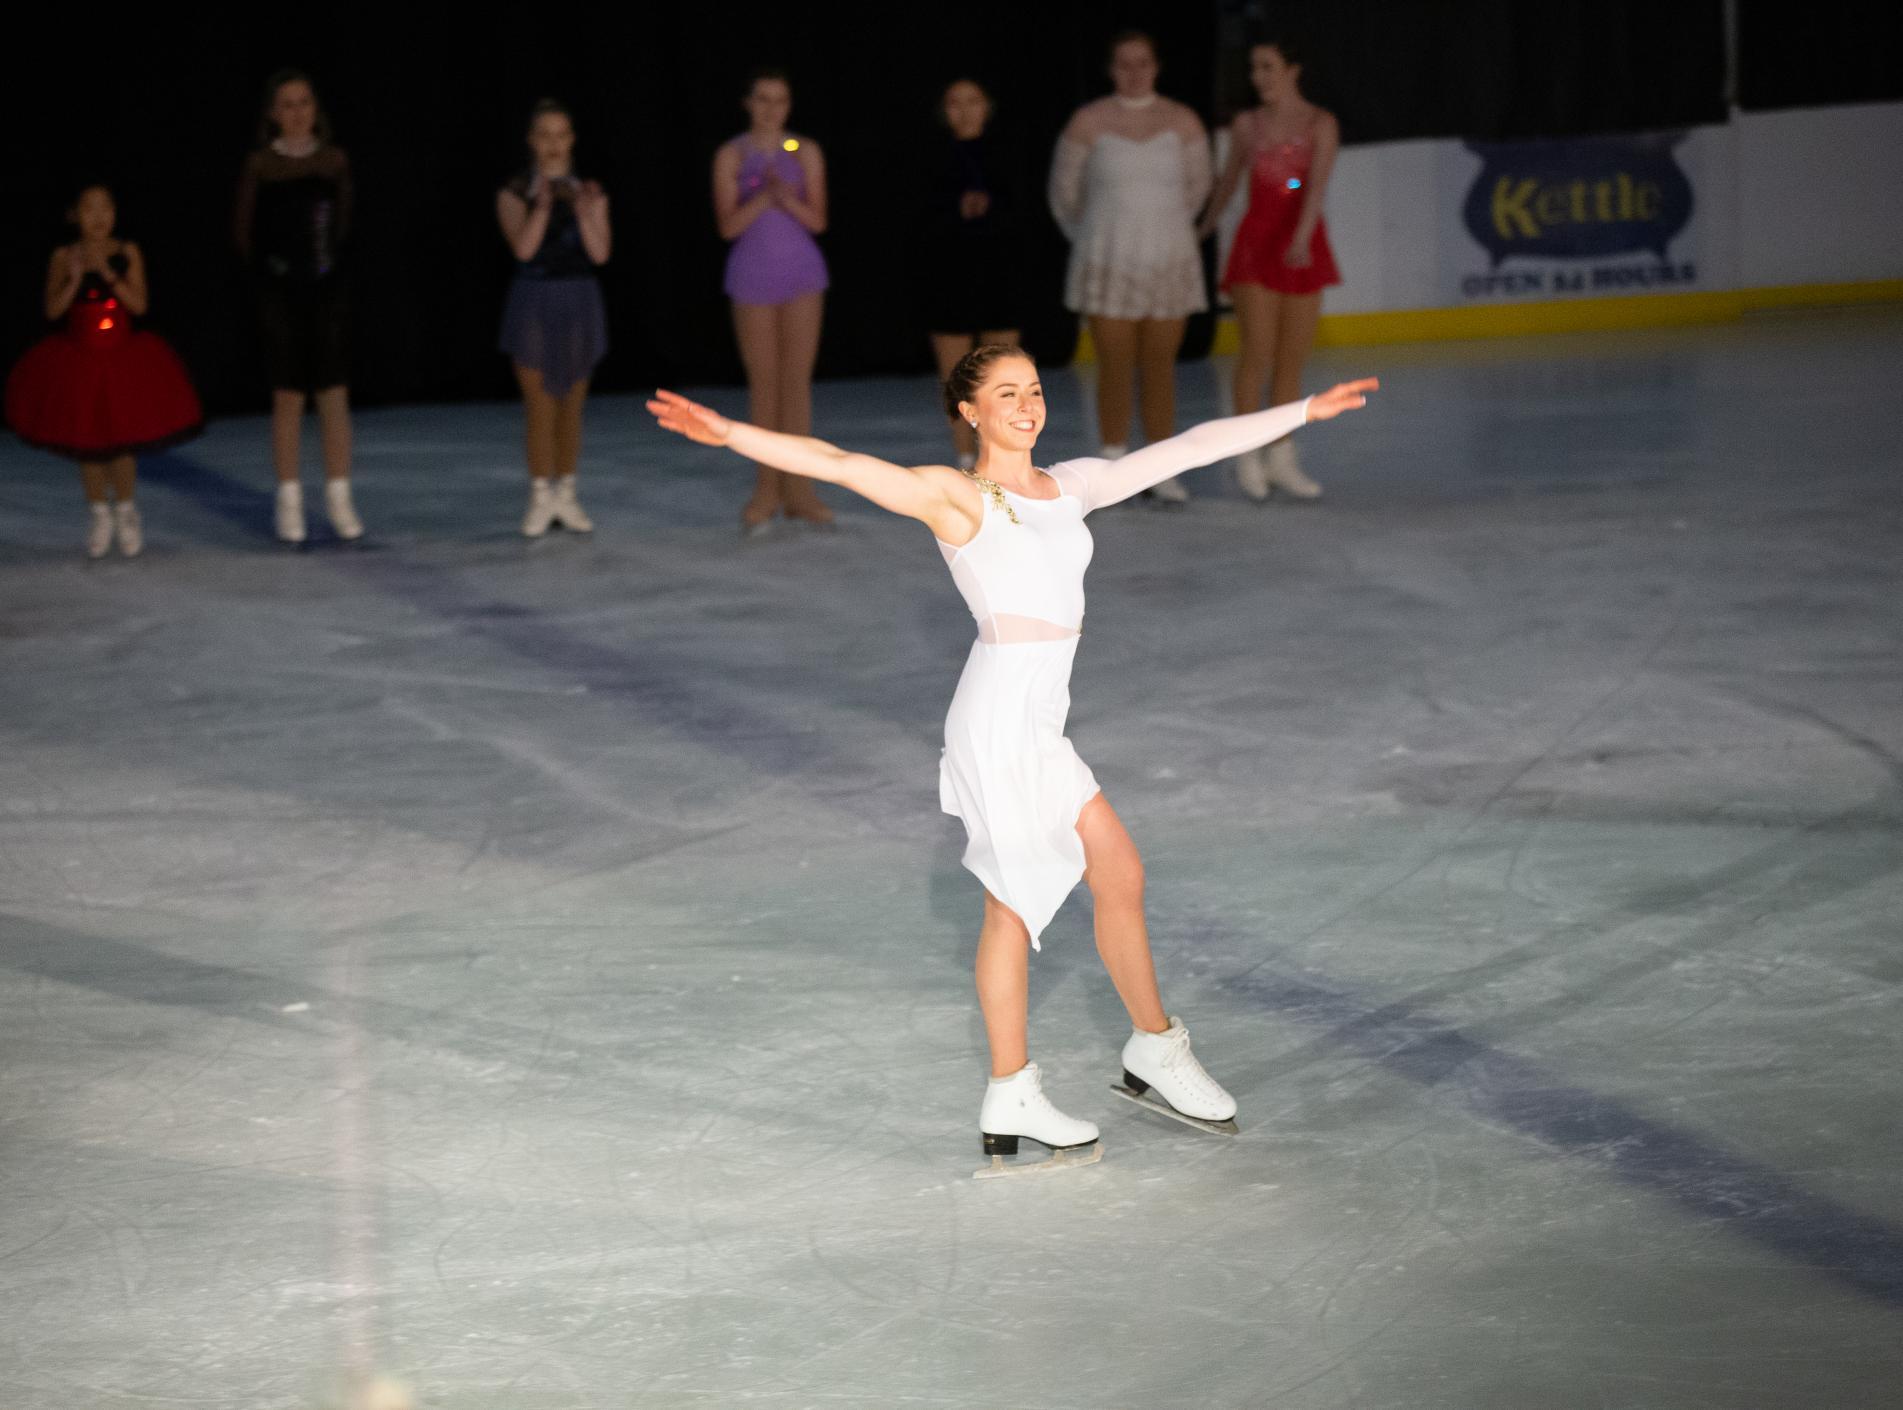 Spirit Ice Arena